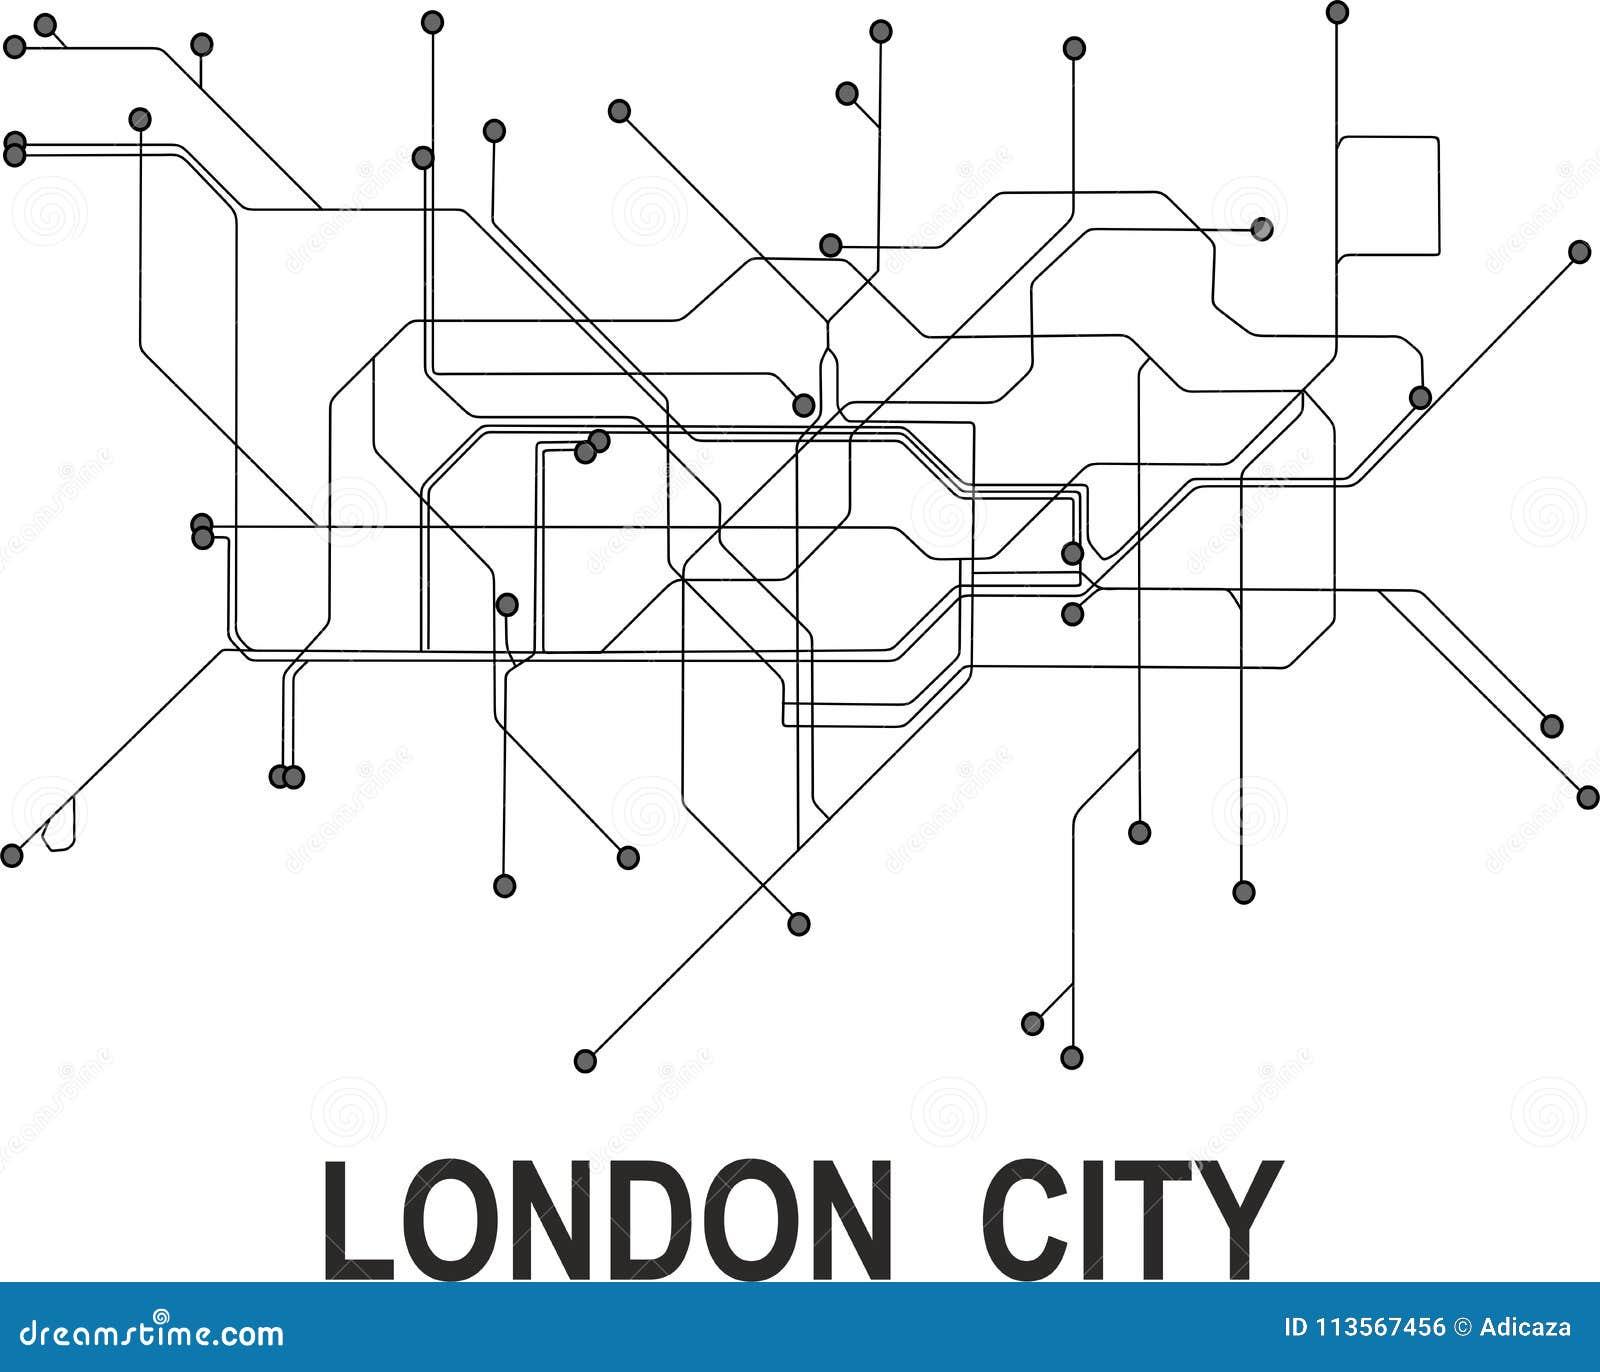 London City Map Stock Vector Illustration Of City Station 113567456